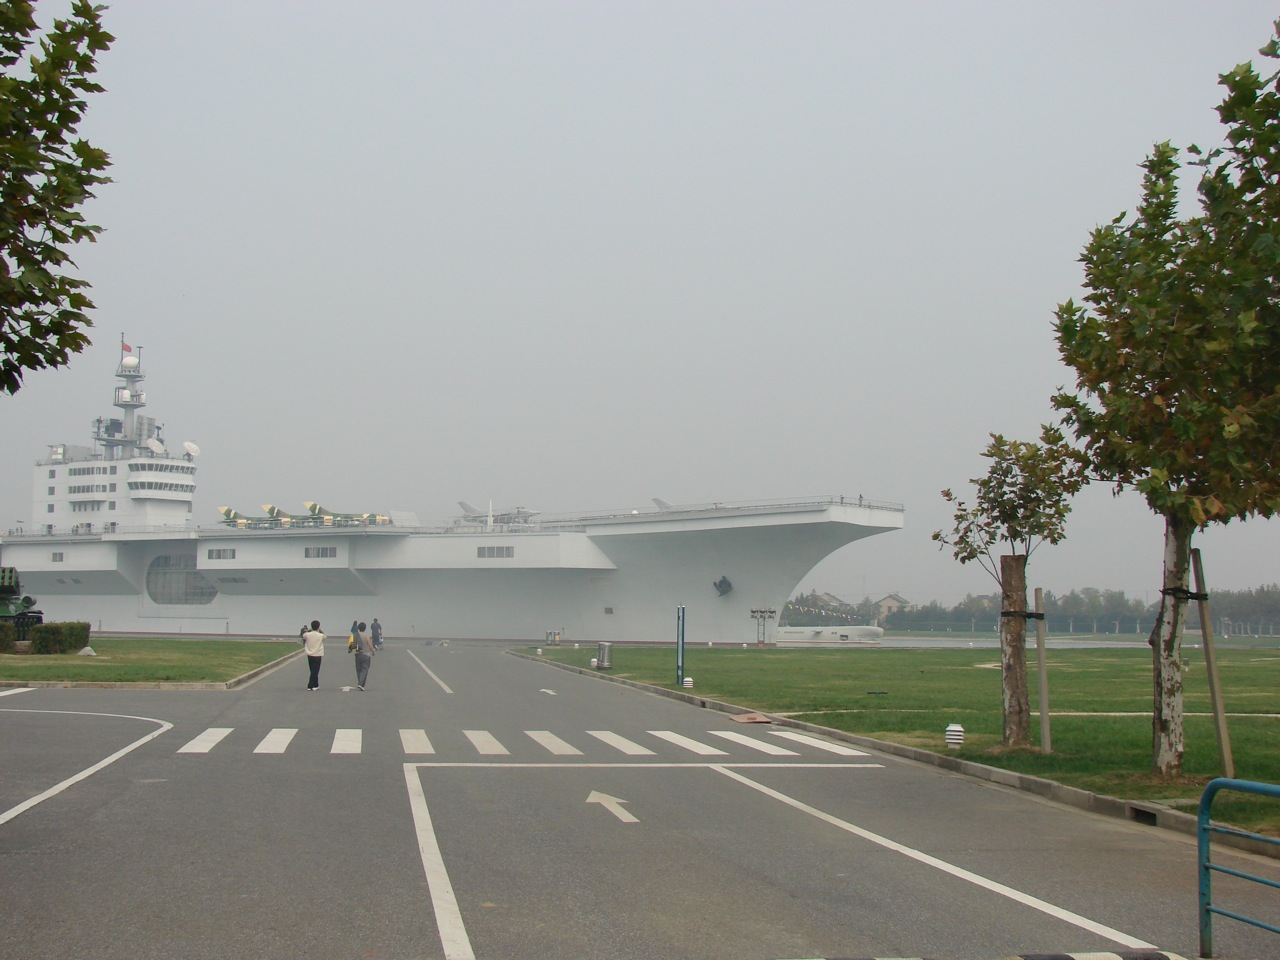 https://1.bp.blogspot.com/_ej5kQwZWlzM/TLU9Go1UqGI/AAAAAAAABIQ/95wMenPRlE4/s1600/New_Chinease_Aircraft_Carrier.jpg